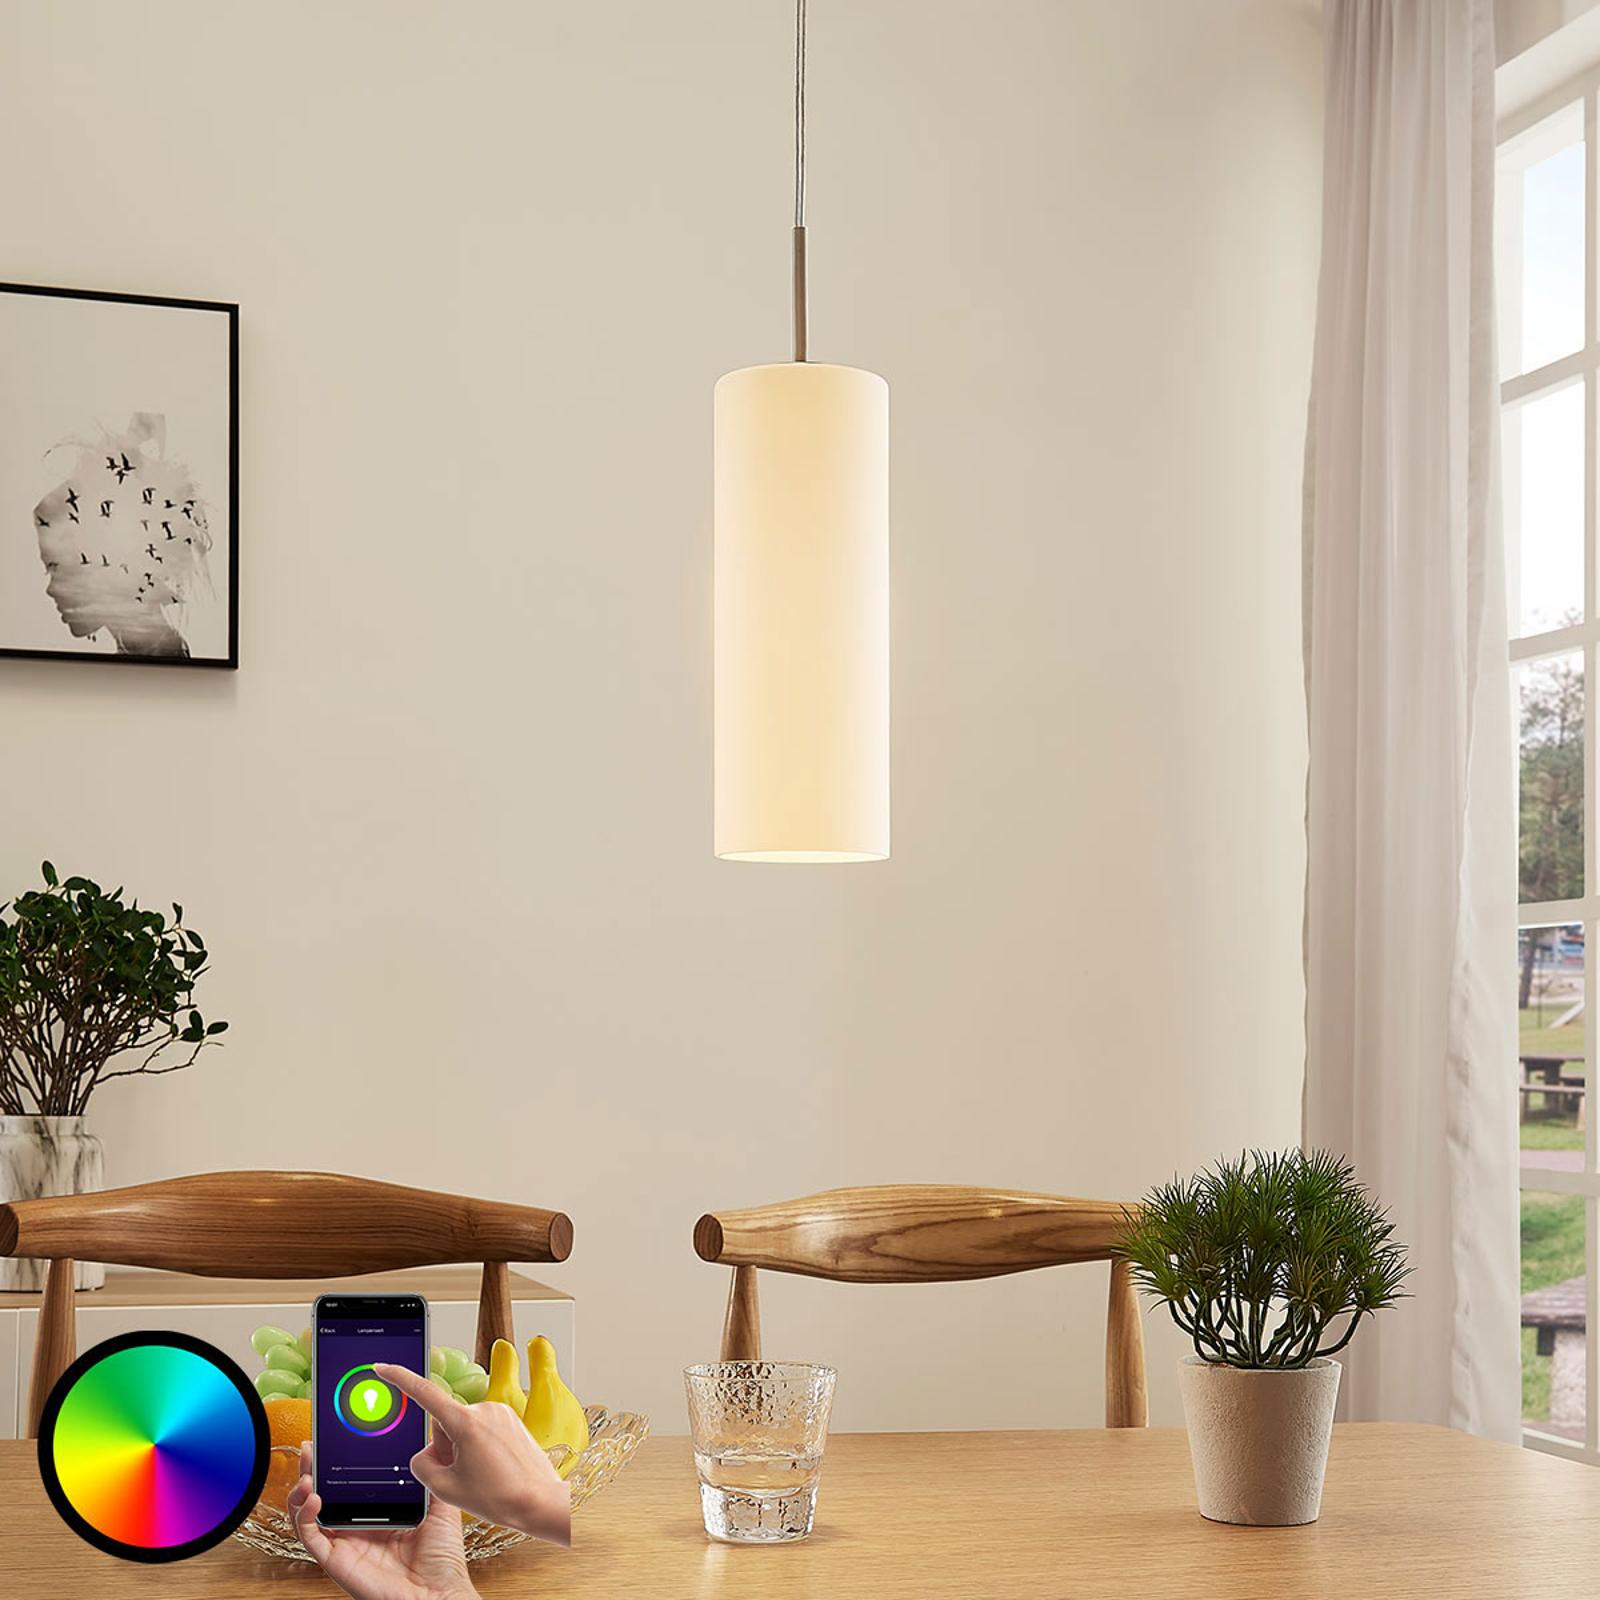 Lindby Smart LED-riippuvalaisin Felice, RGB-lamppu